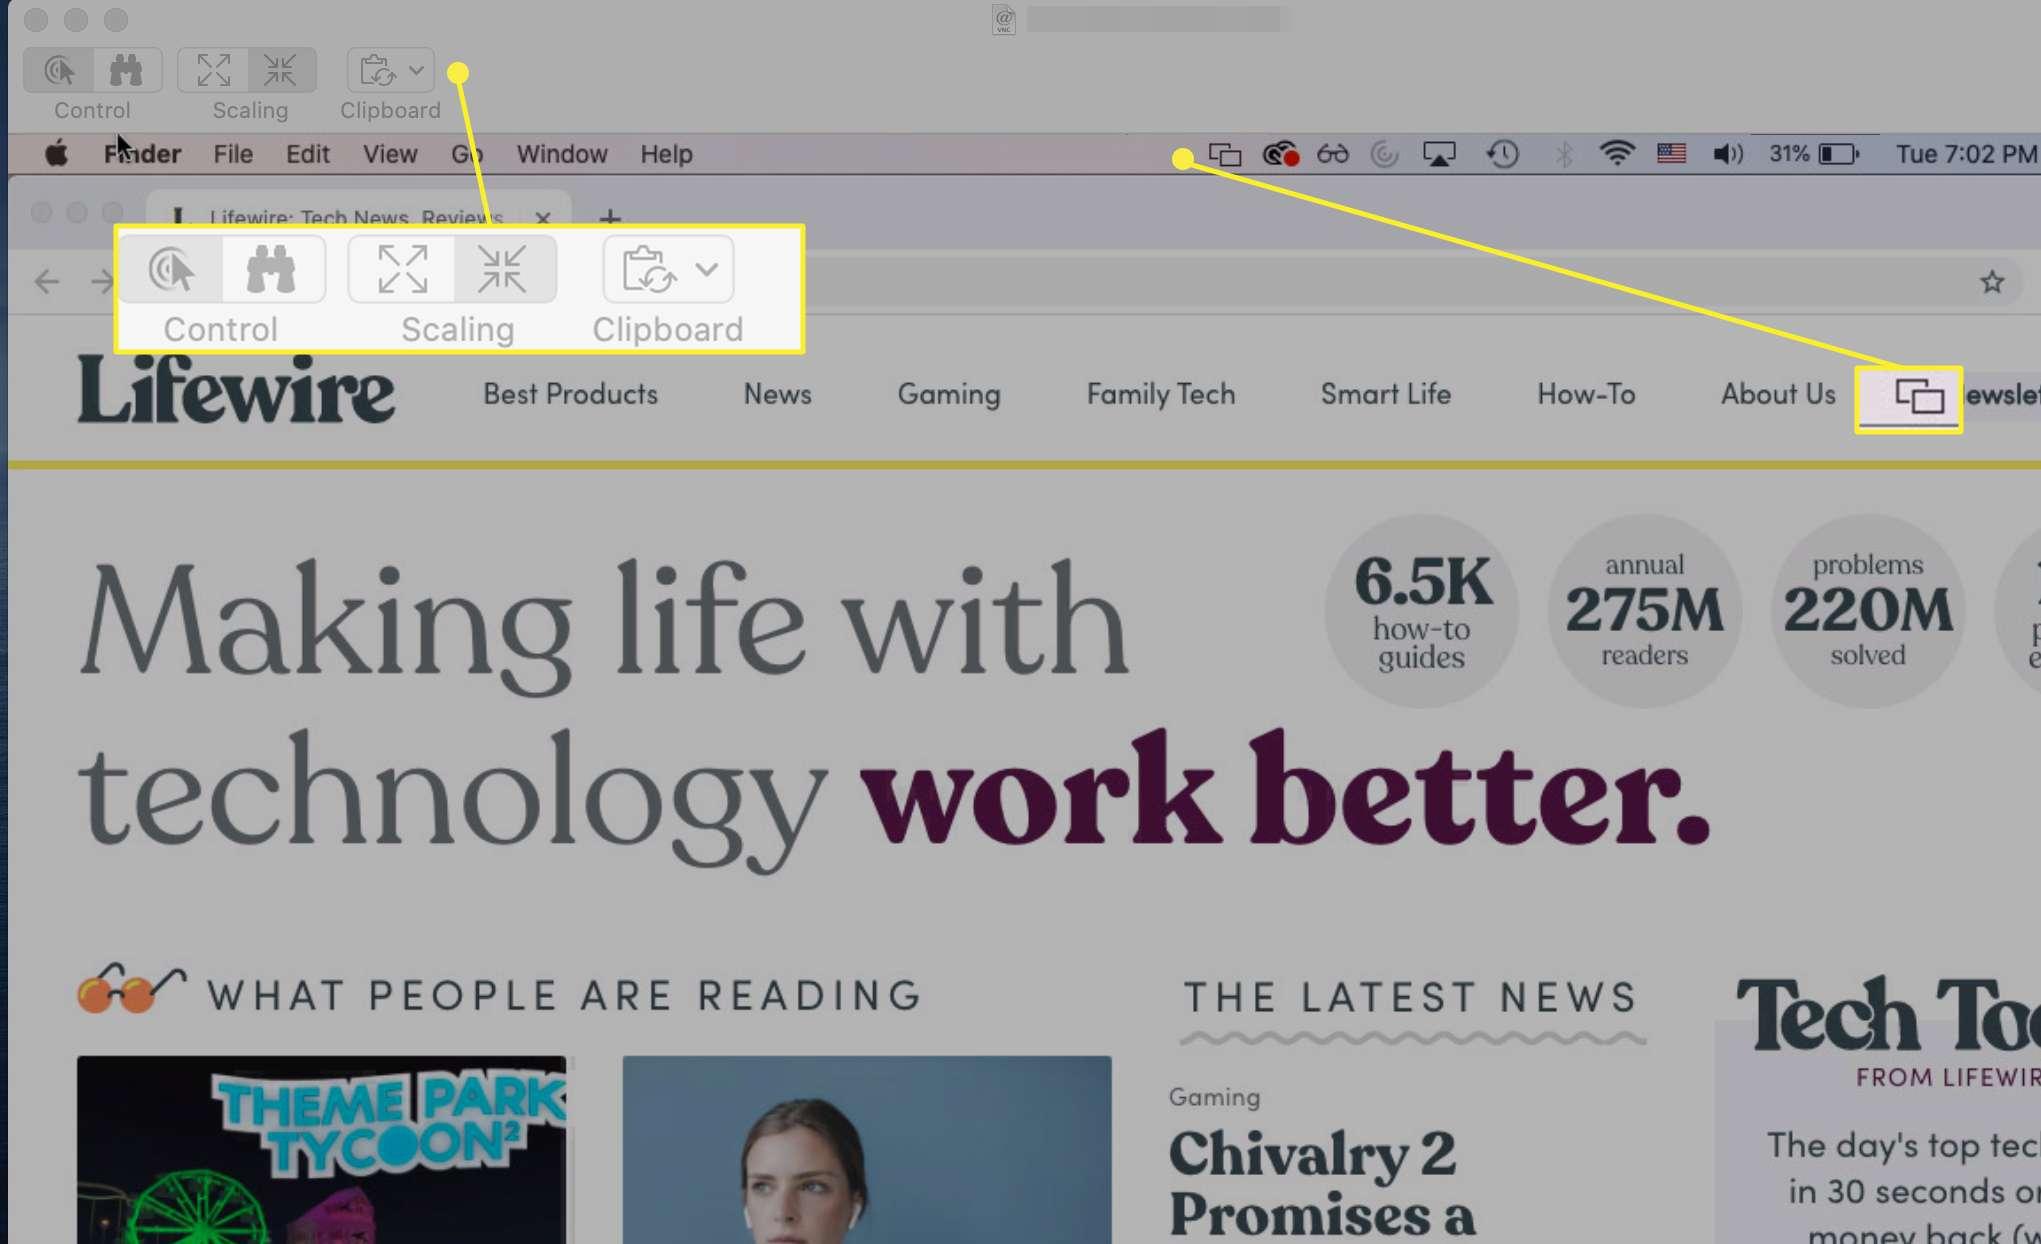 Screen sharing controls and menu icon during an active sharing session between Macs